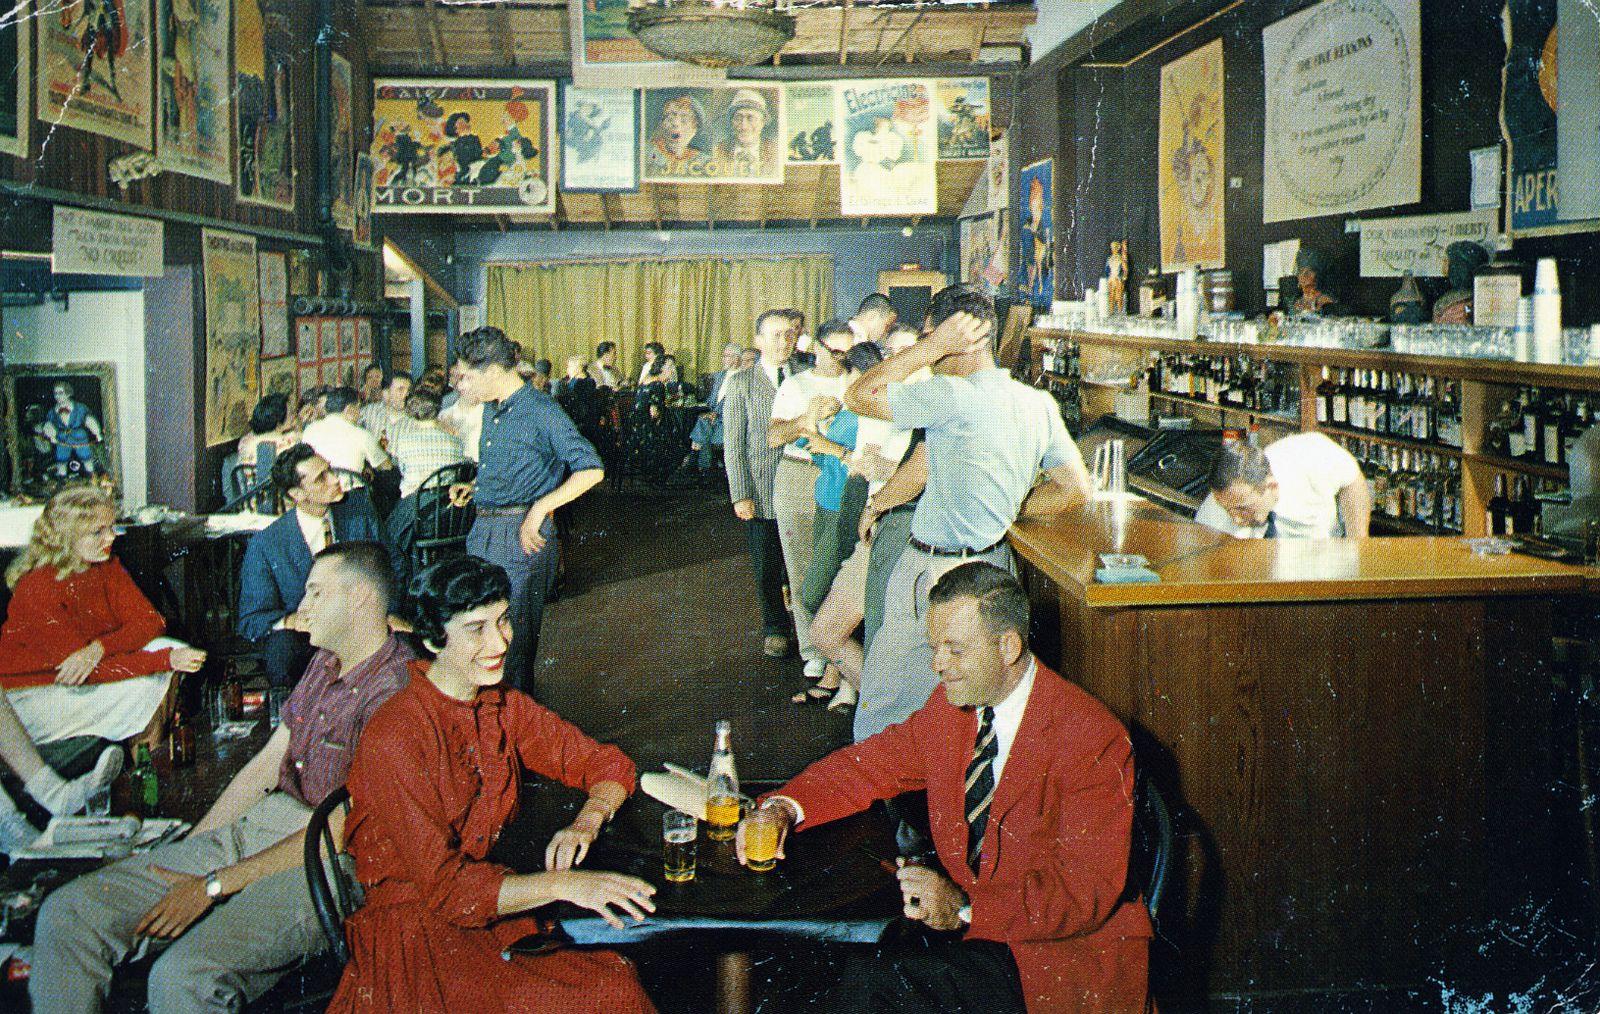 Five Reasons Steak & Ale House - Lenox, Massachusetts.